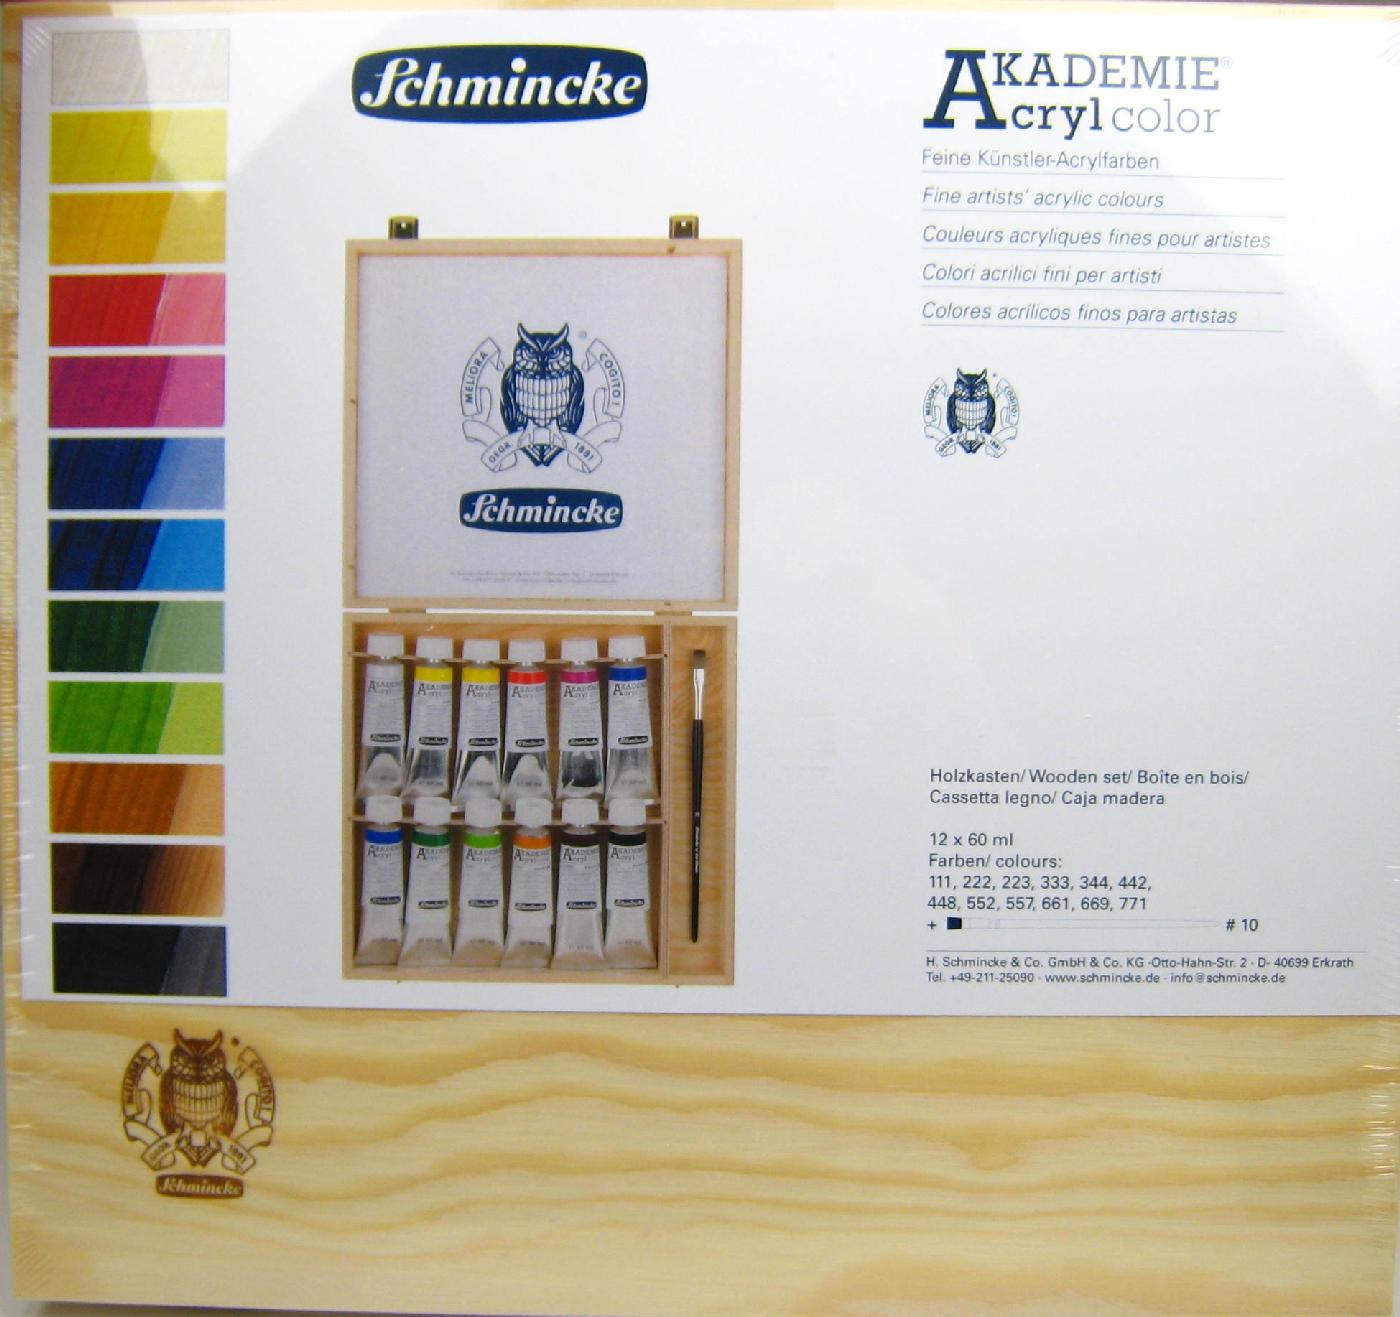 AKADEMIE Acryl Malkästen Holzkasten, 12 x 60 ml Schmincke 76 014 097